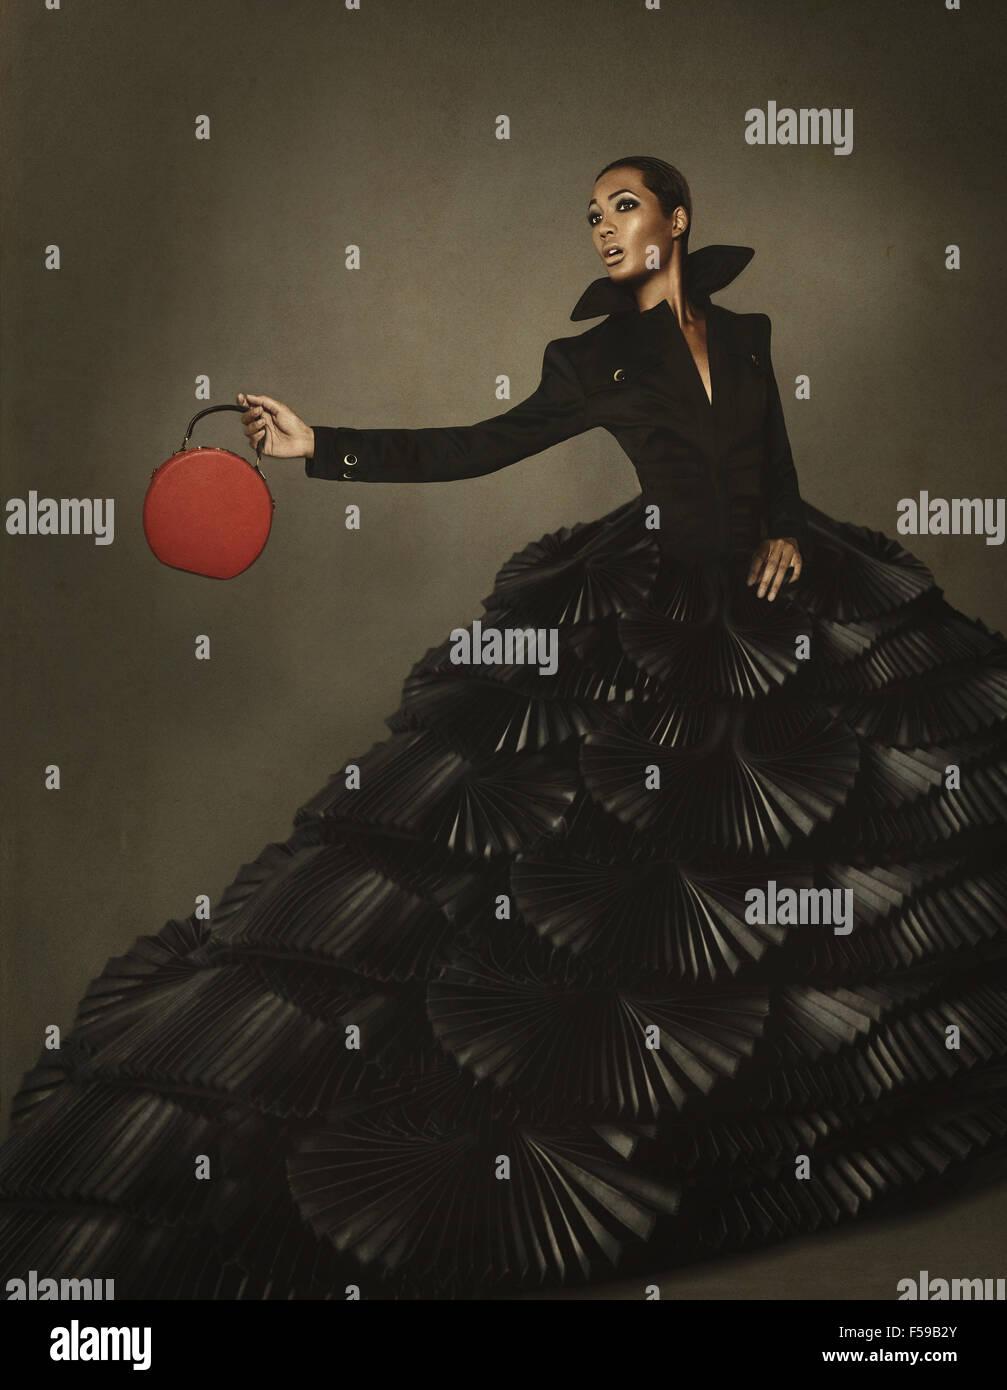 Fashion editorial model in avant garde gown, holding handbag Stock ...